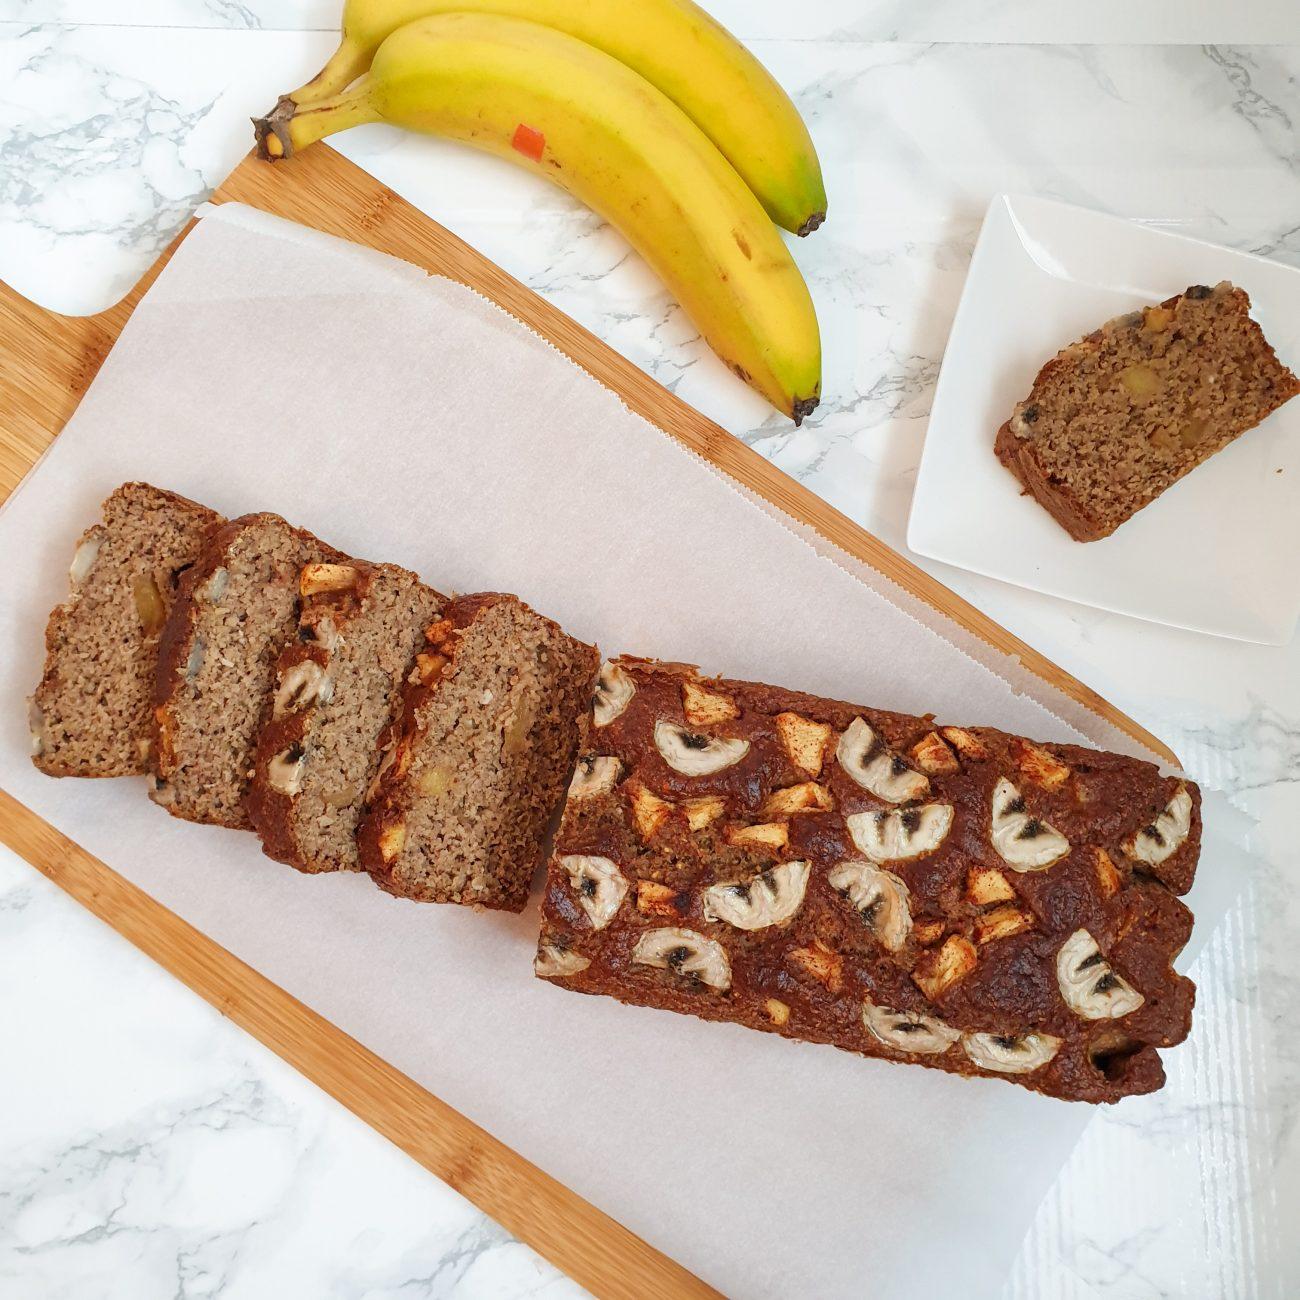 Vanille bananenbrood: gezond, lekker, makkelijk